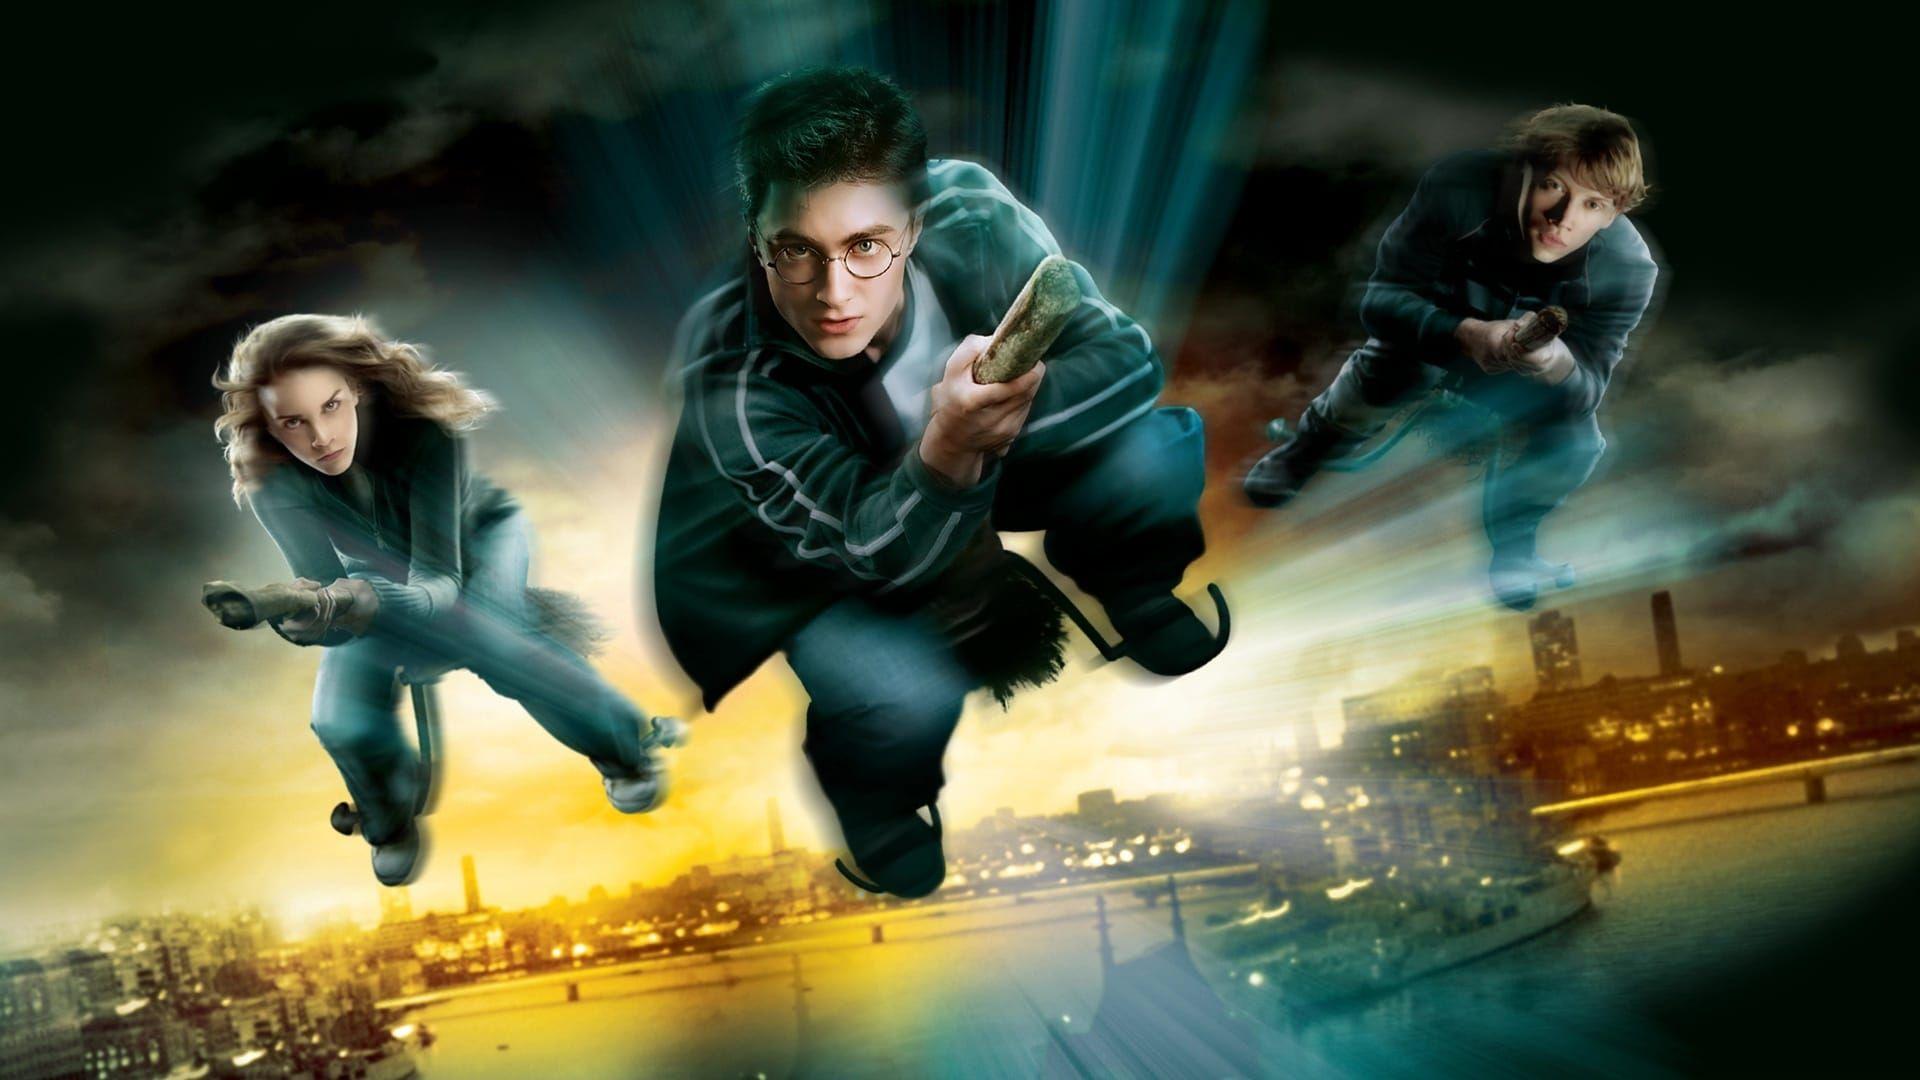 Pin By Helmi Noob On Harry Potter O O Full Movies Online Free Free Movies Online Full Movies